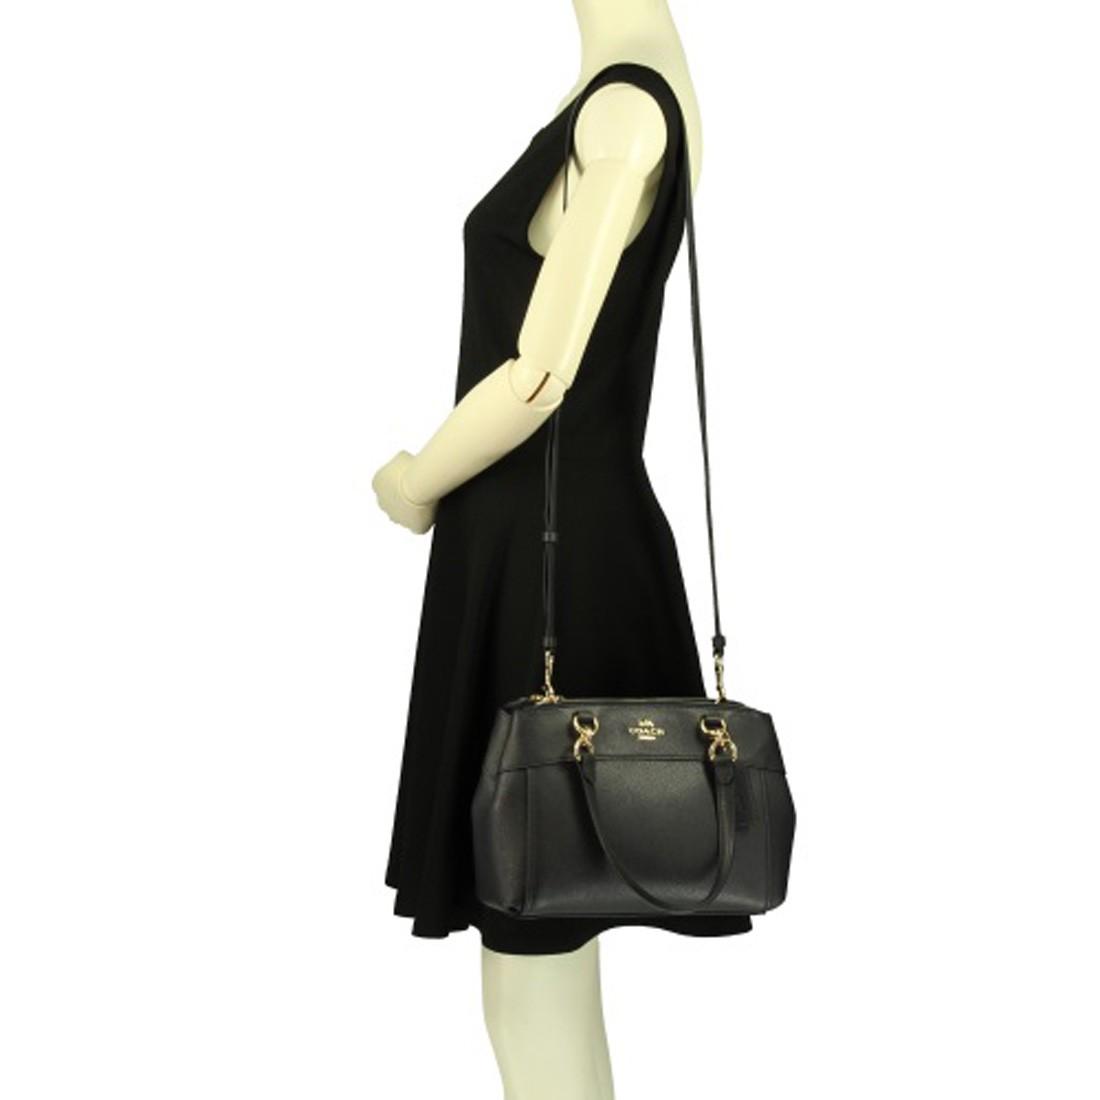 8adab28d21 ... satchel handbag crossbody signature khaki gabys bags d75c7 66b4c   official nwt coach mini brooke carryall crossbody tote leather bd675 f32cc